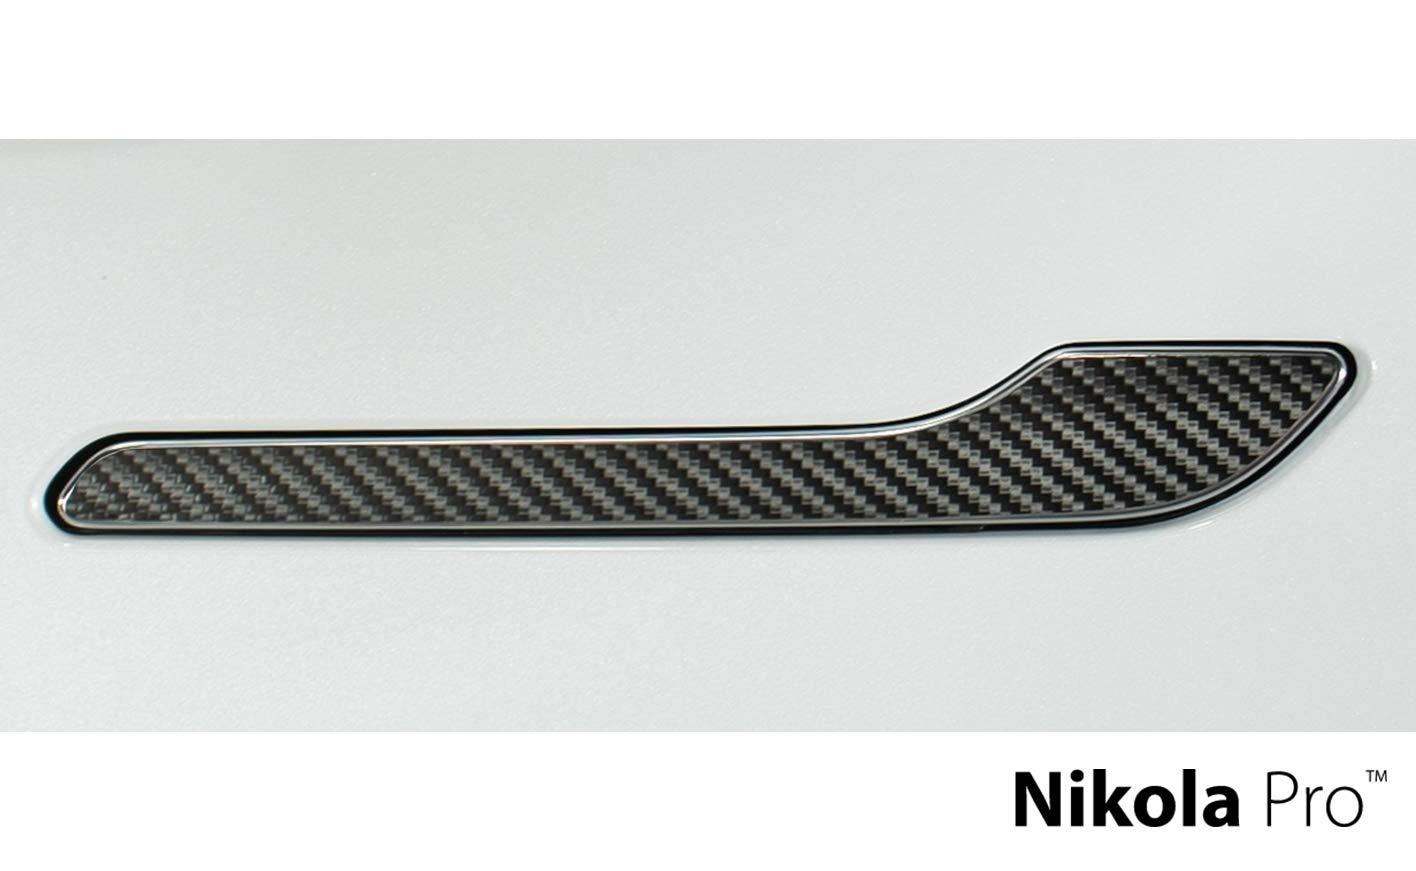 Nikola Pro Tesla Model 3 Door Handle Wrap Kit (Black Carbon Fiber) by Nikola Pro (Image #1)